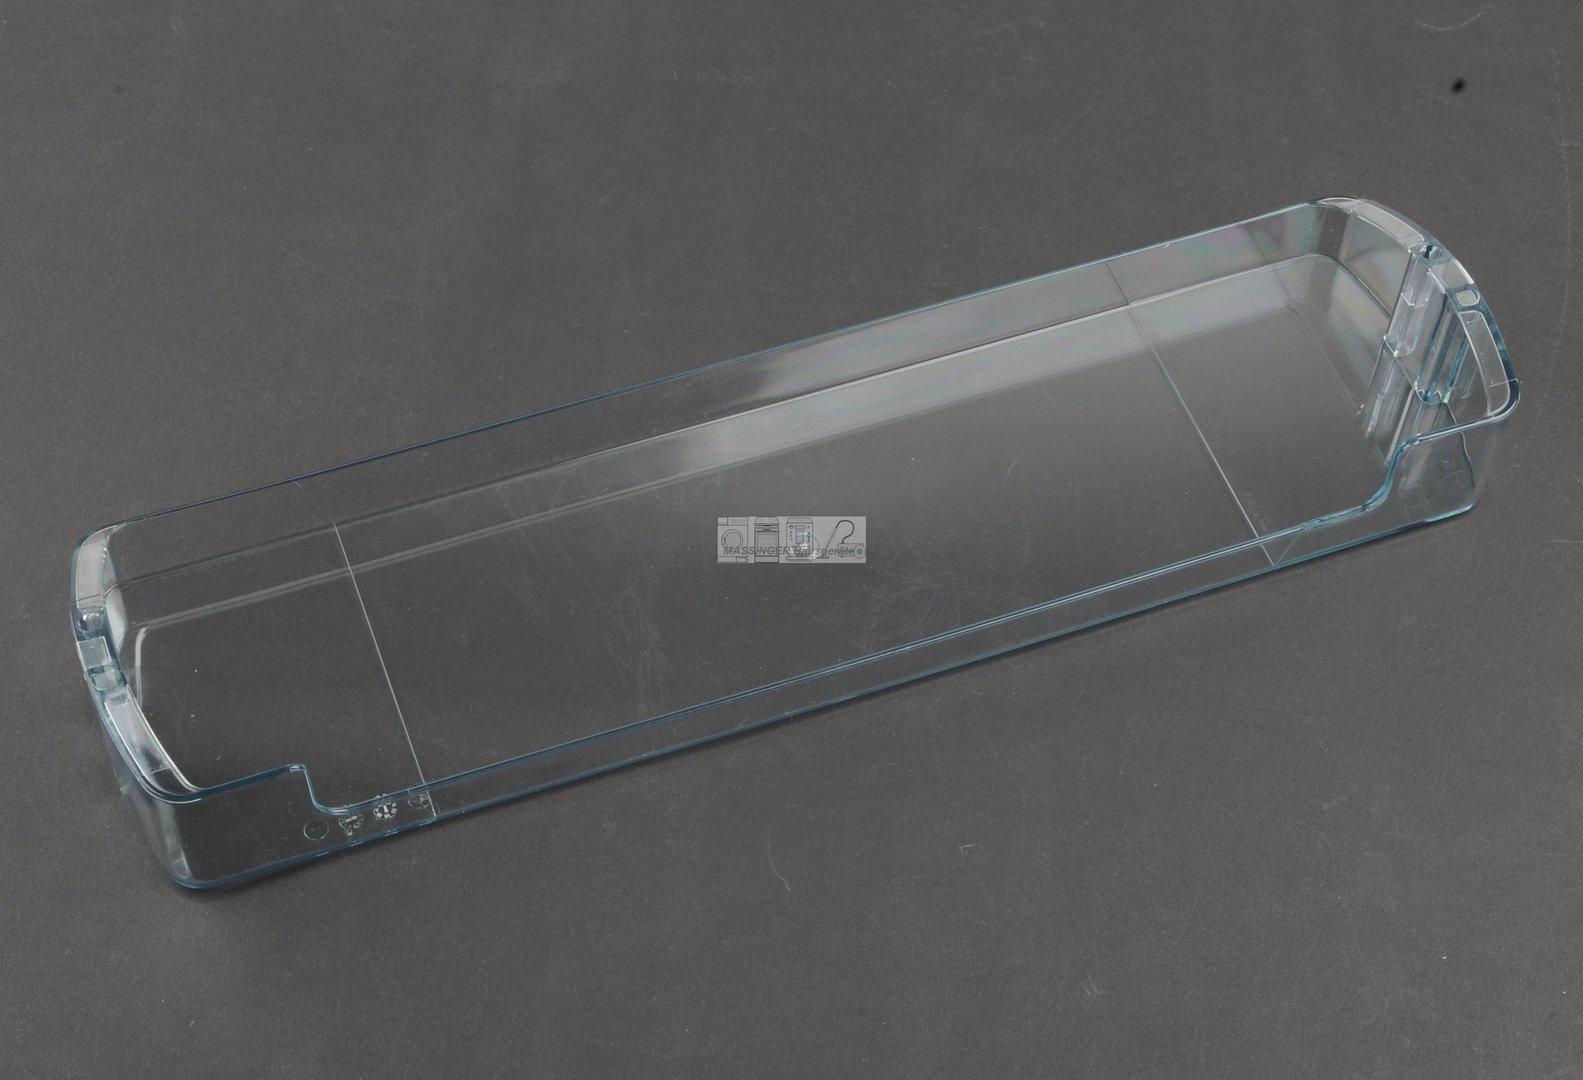 Gorenje Kühlschrank Ersatzteile Dichtung : Gorenje kühlschrank ersatzteile dichtung türring gorenje